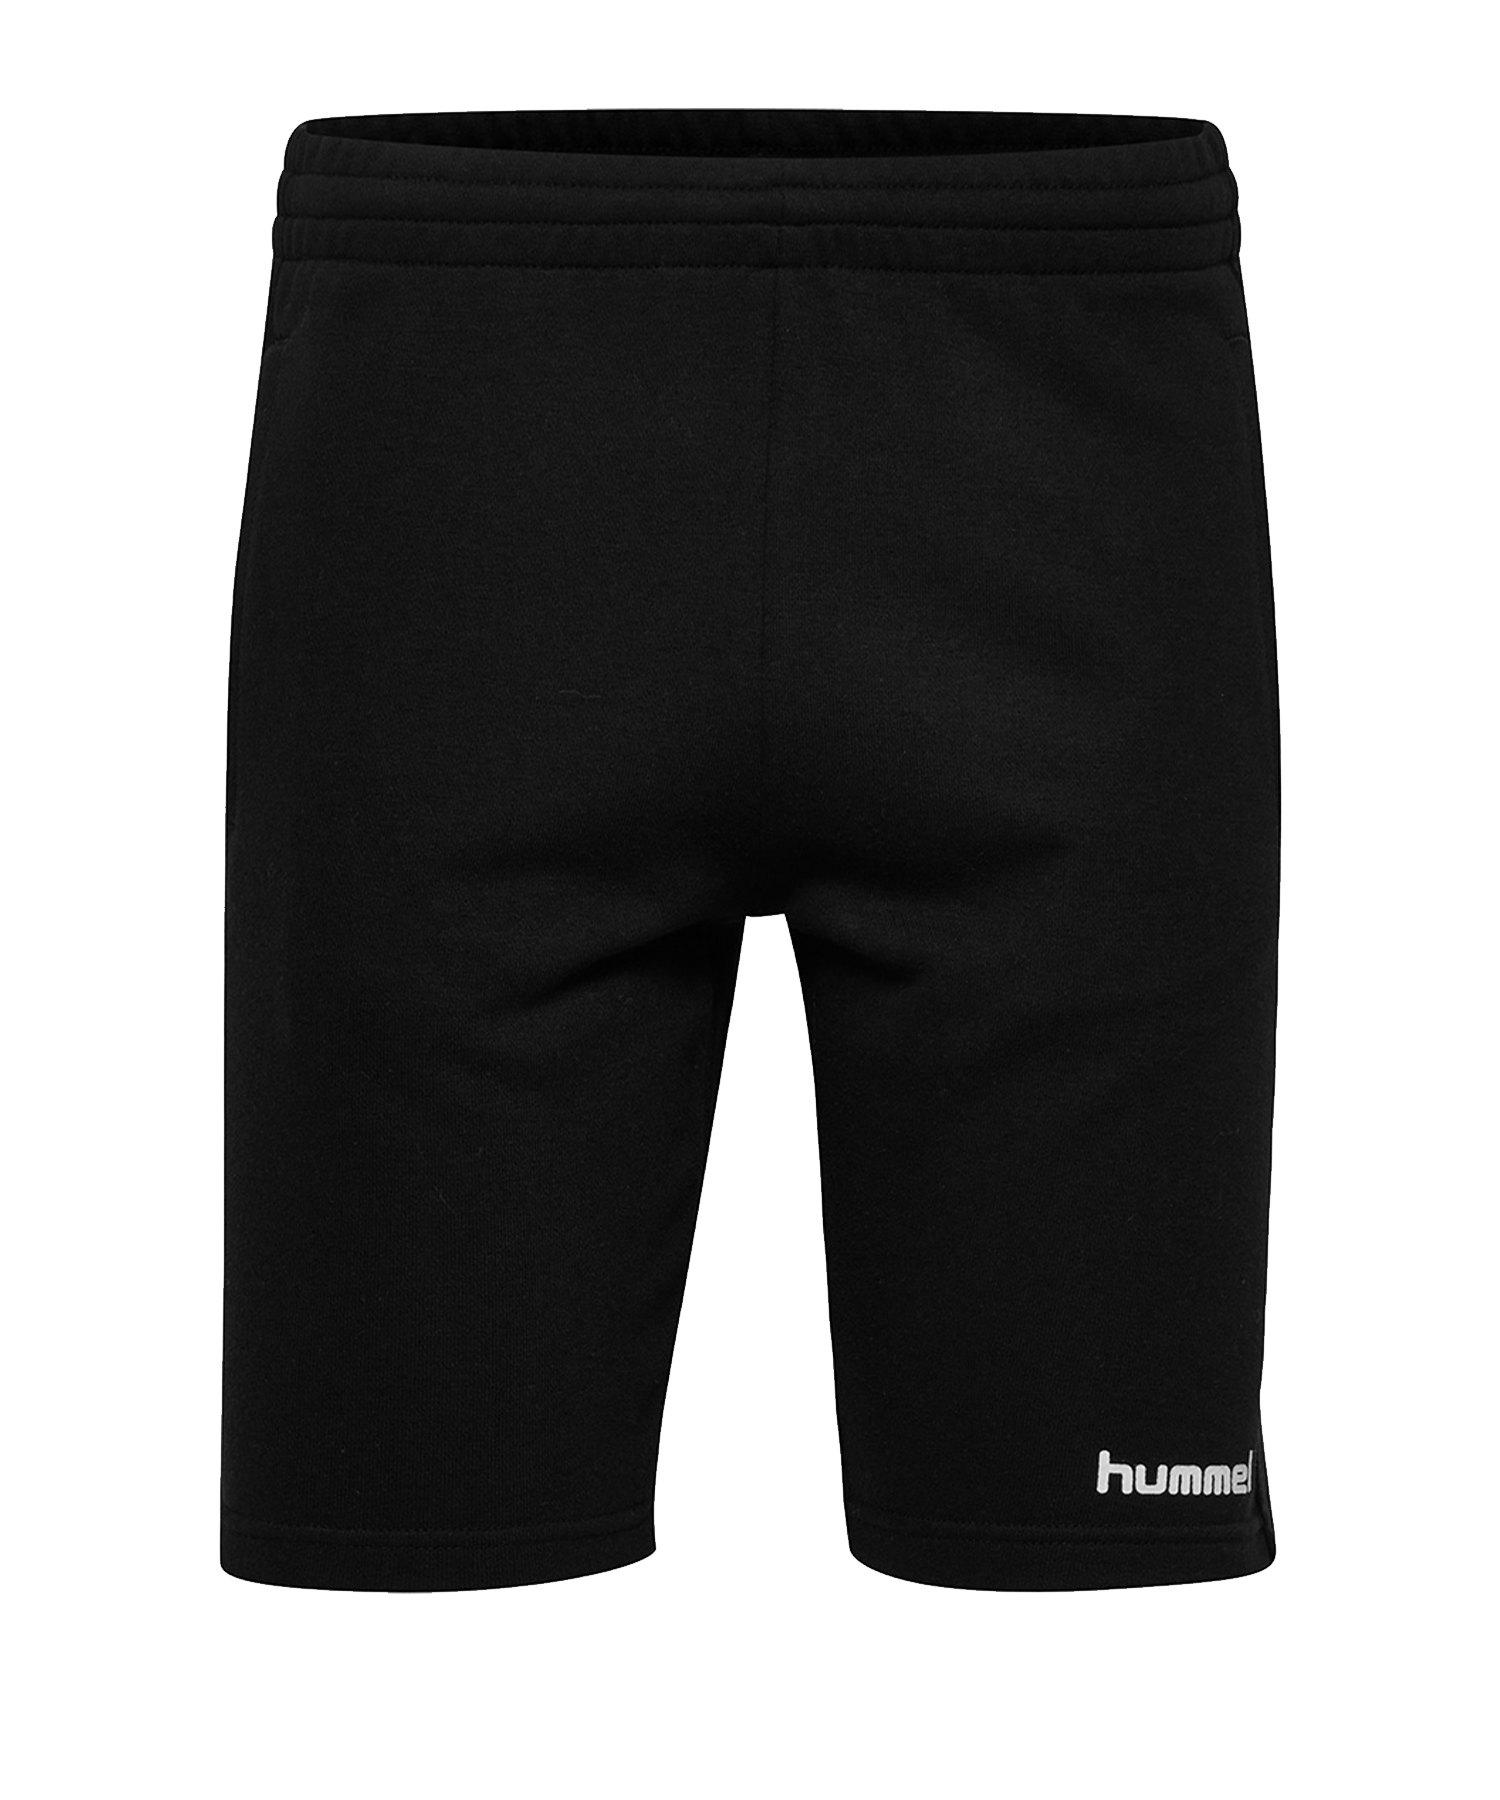 Hummel Cotton Bermuda Short Damen F2001 - Schwarz